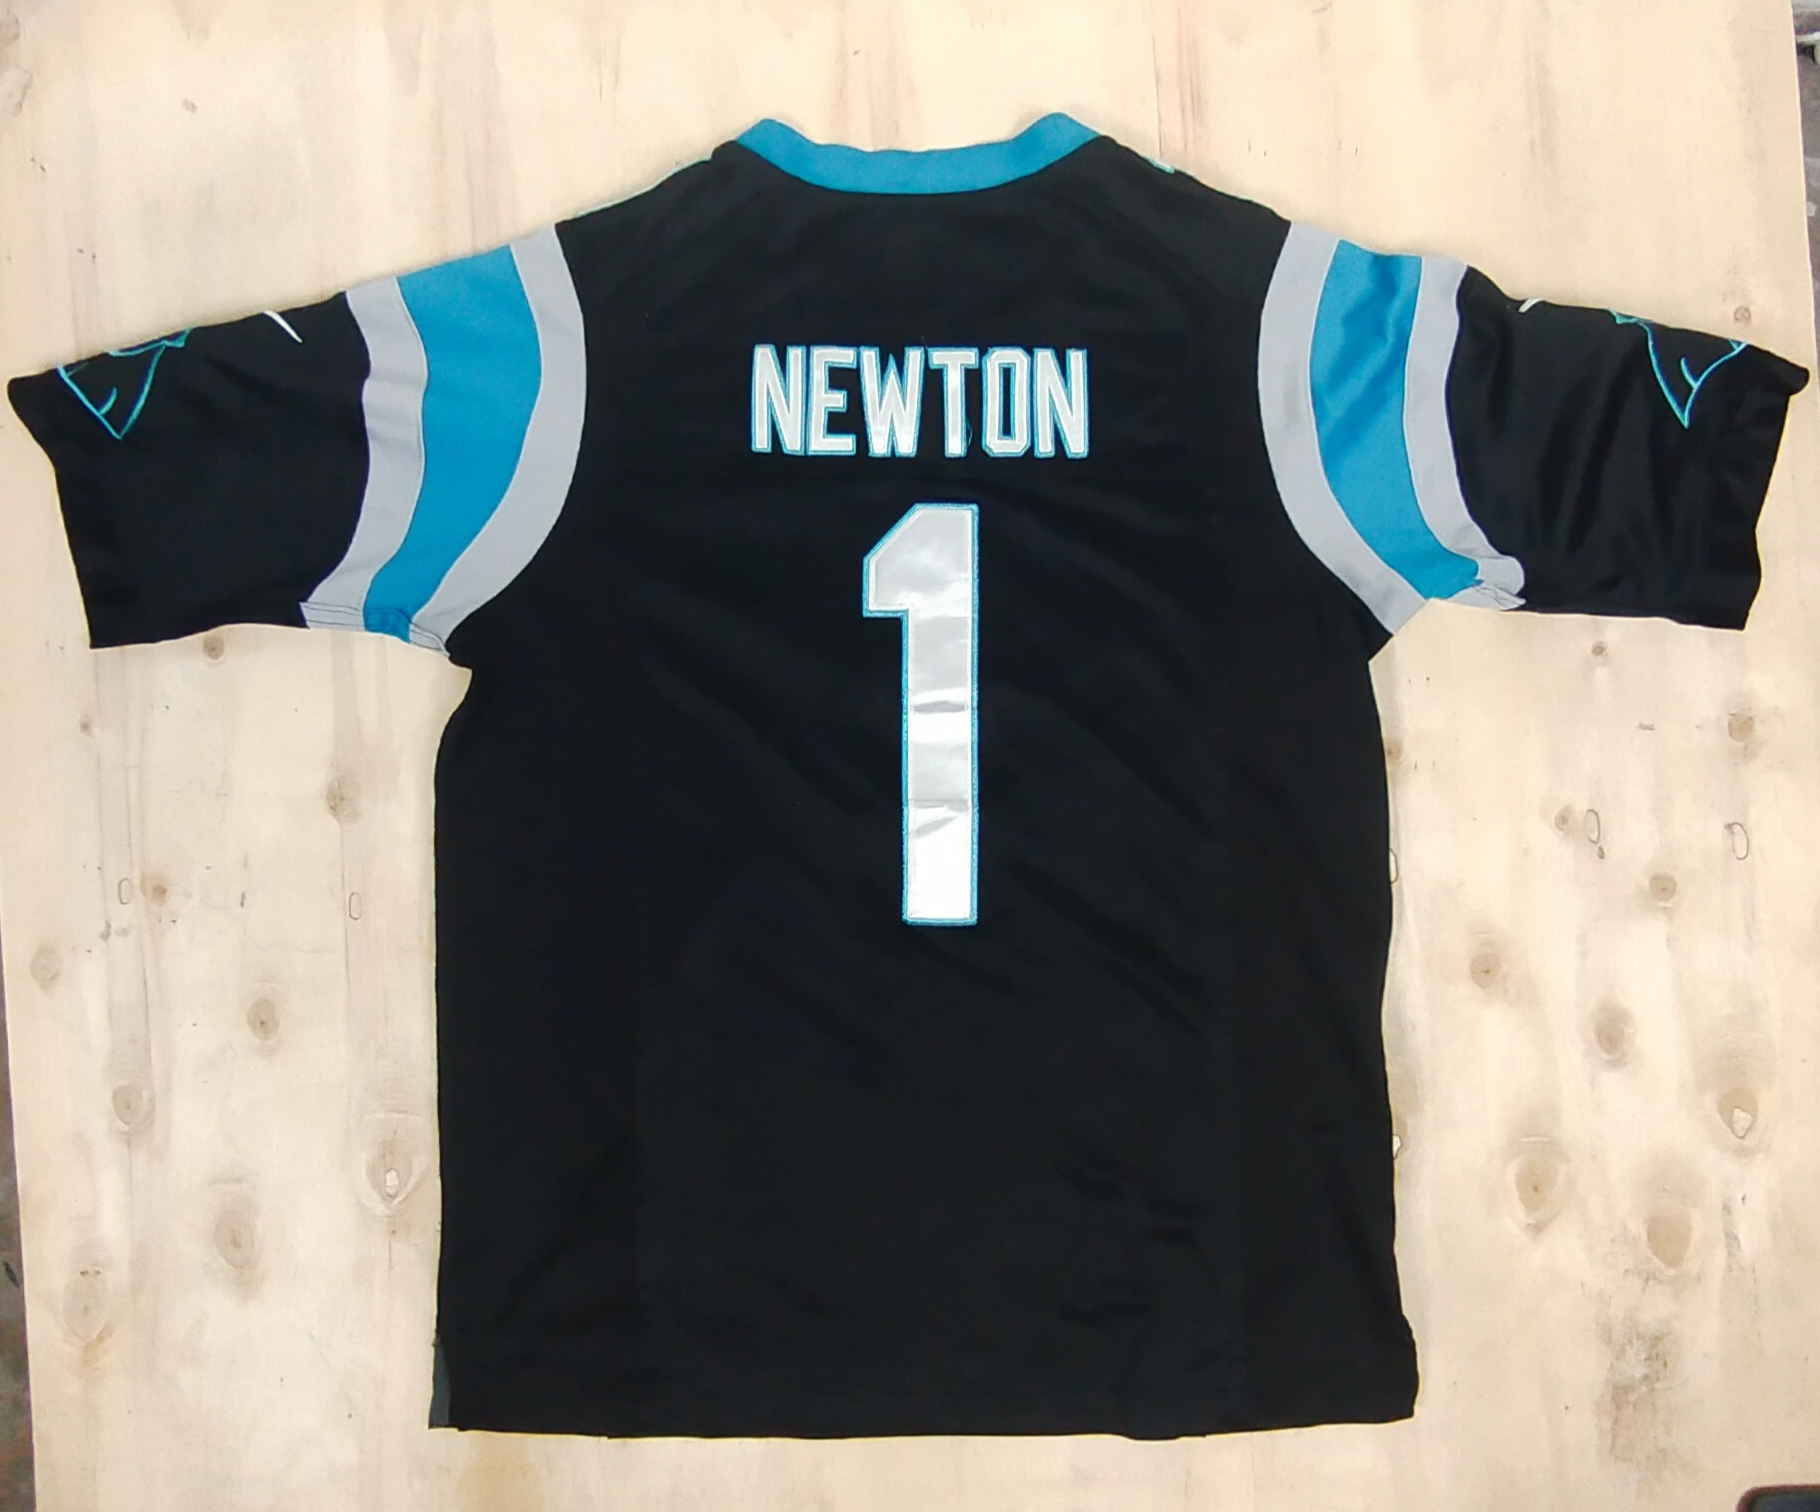 Newton nike - NFL jersey size large